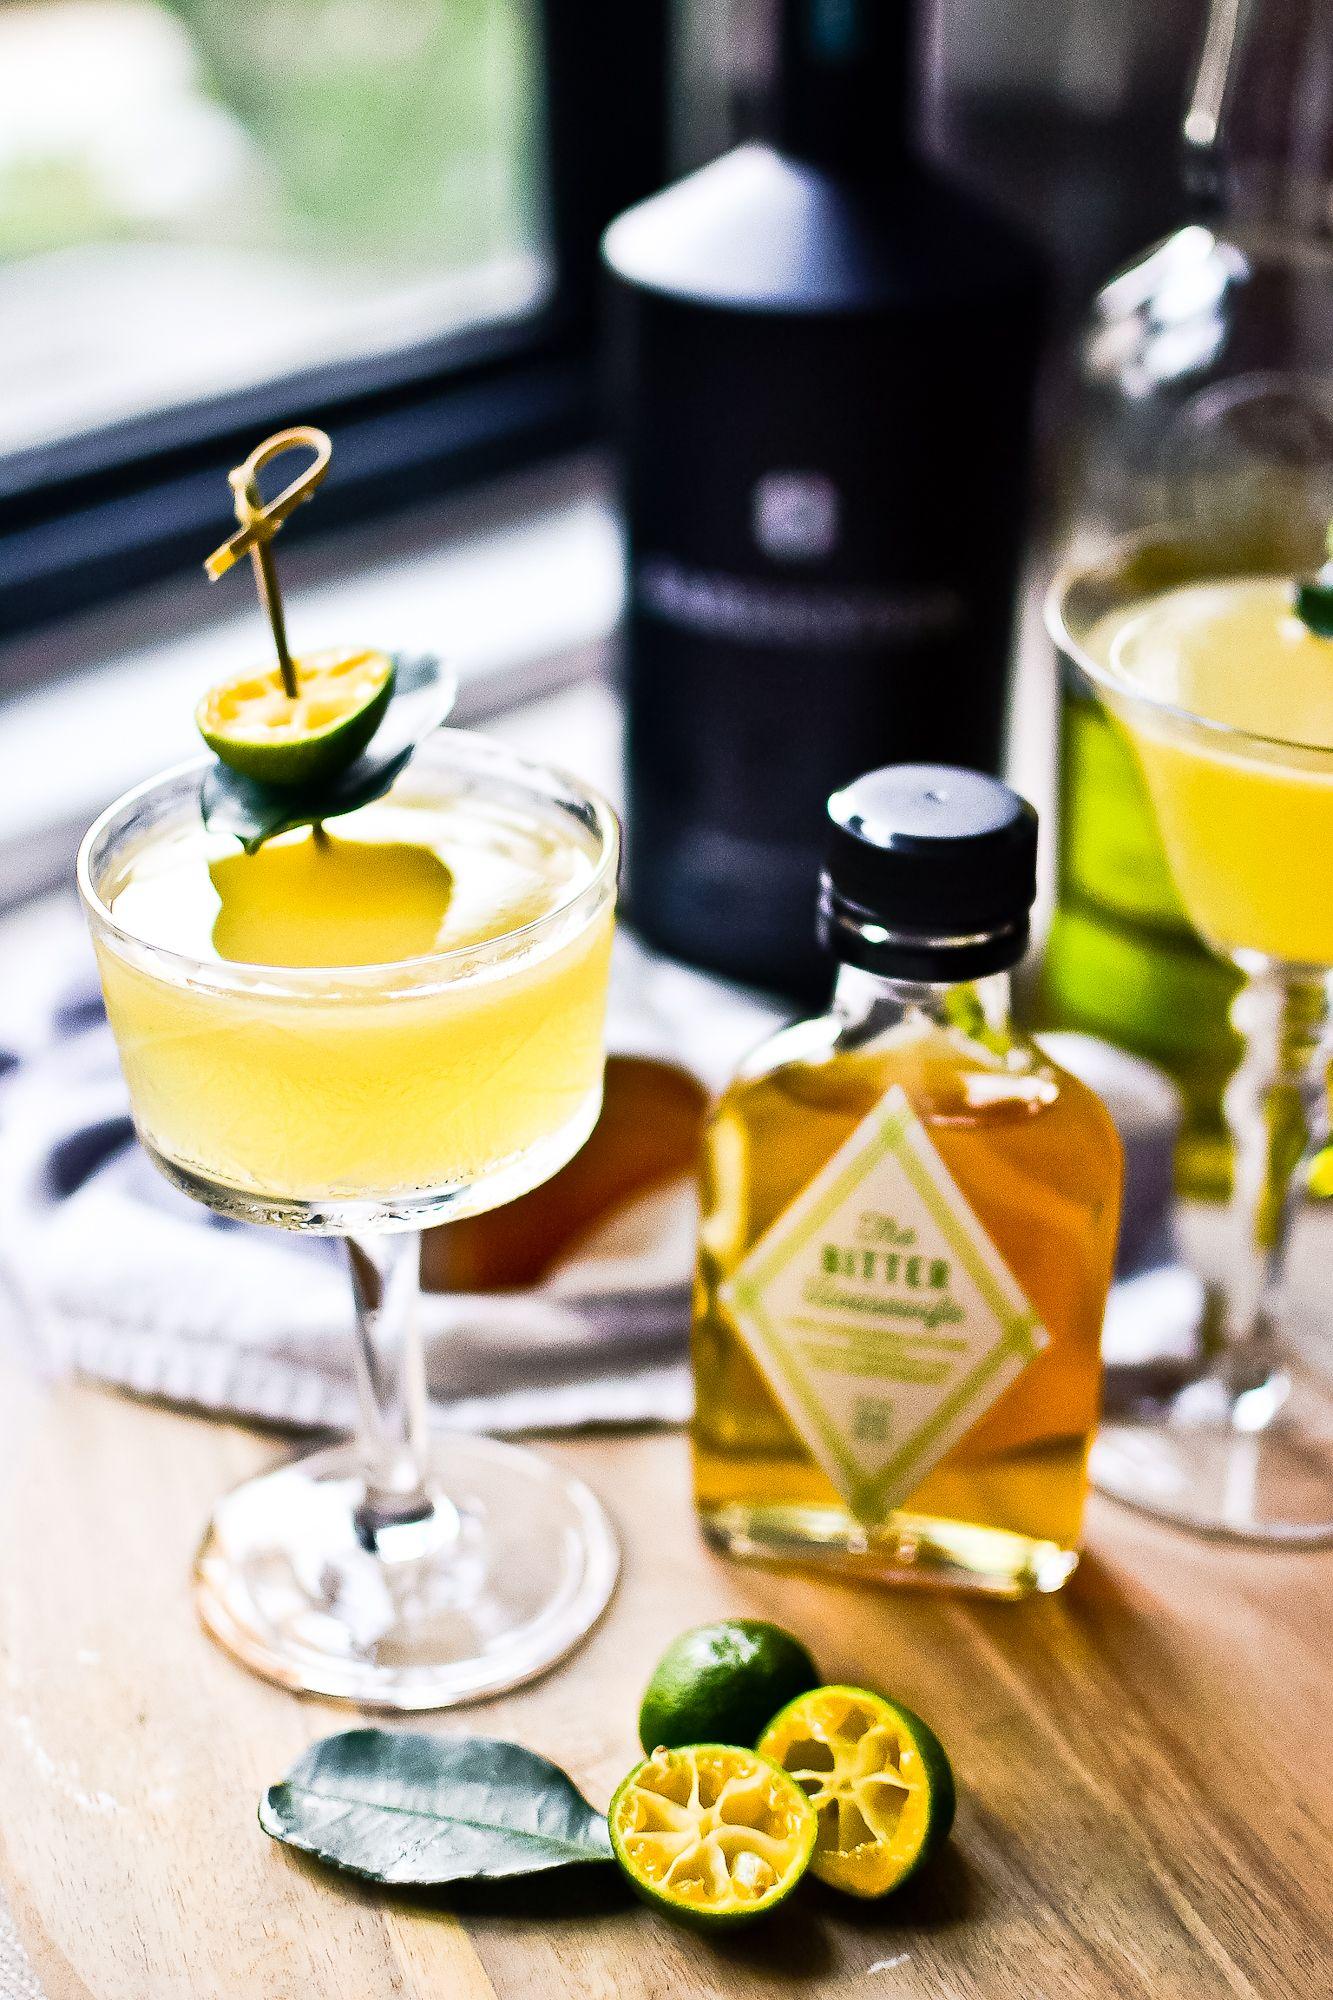 Recipe Calamansi Lemongrass Cocktail With Coriander Bitters Hint Of Spice Recipe Calamansi Gin Cocktails Lemongrass Drink